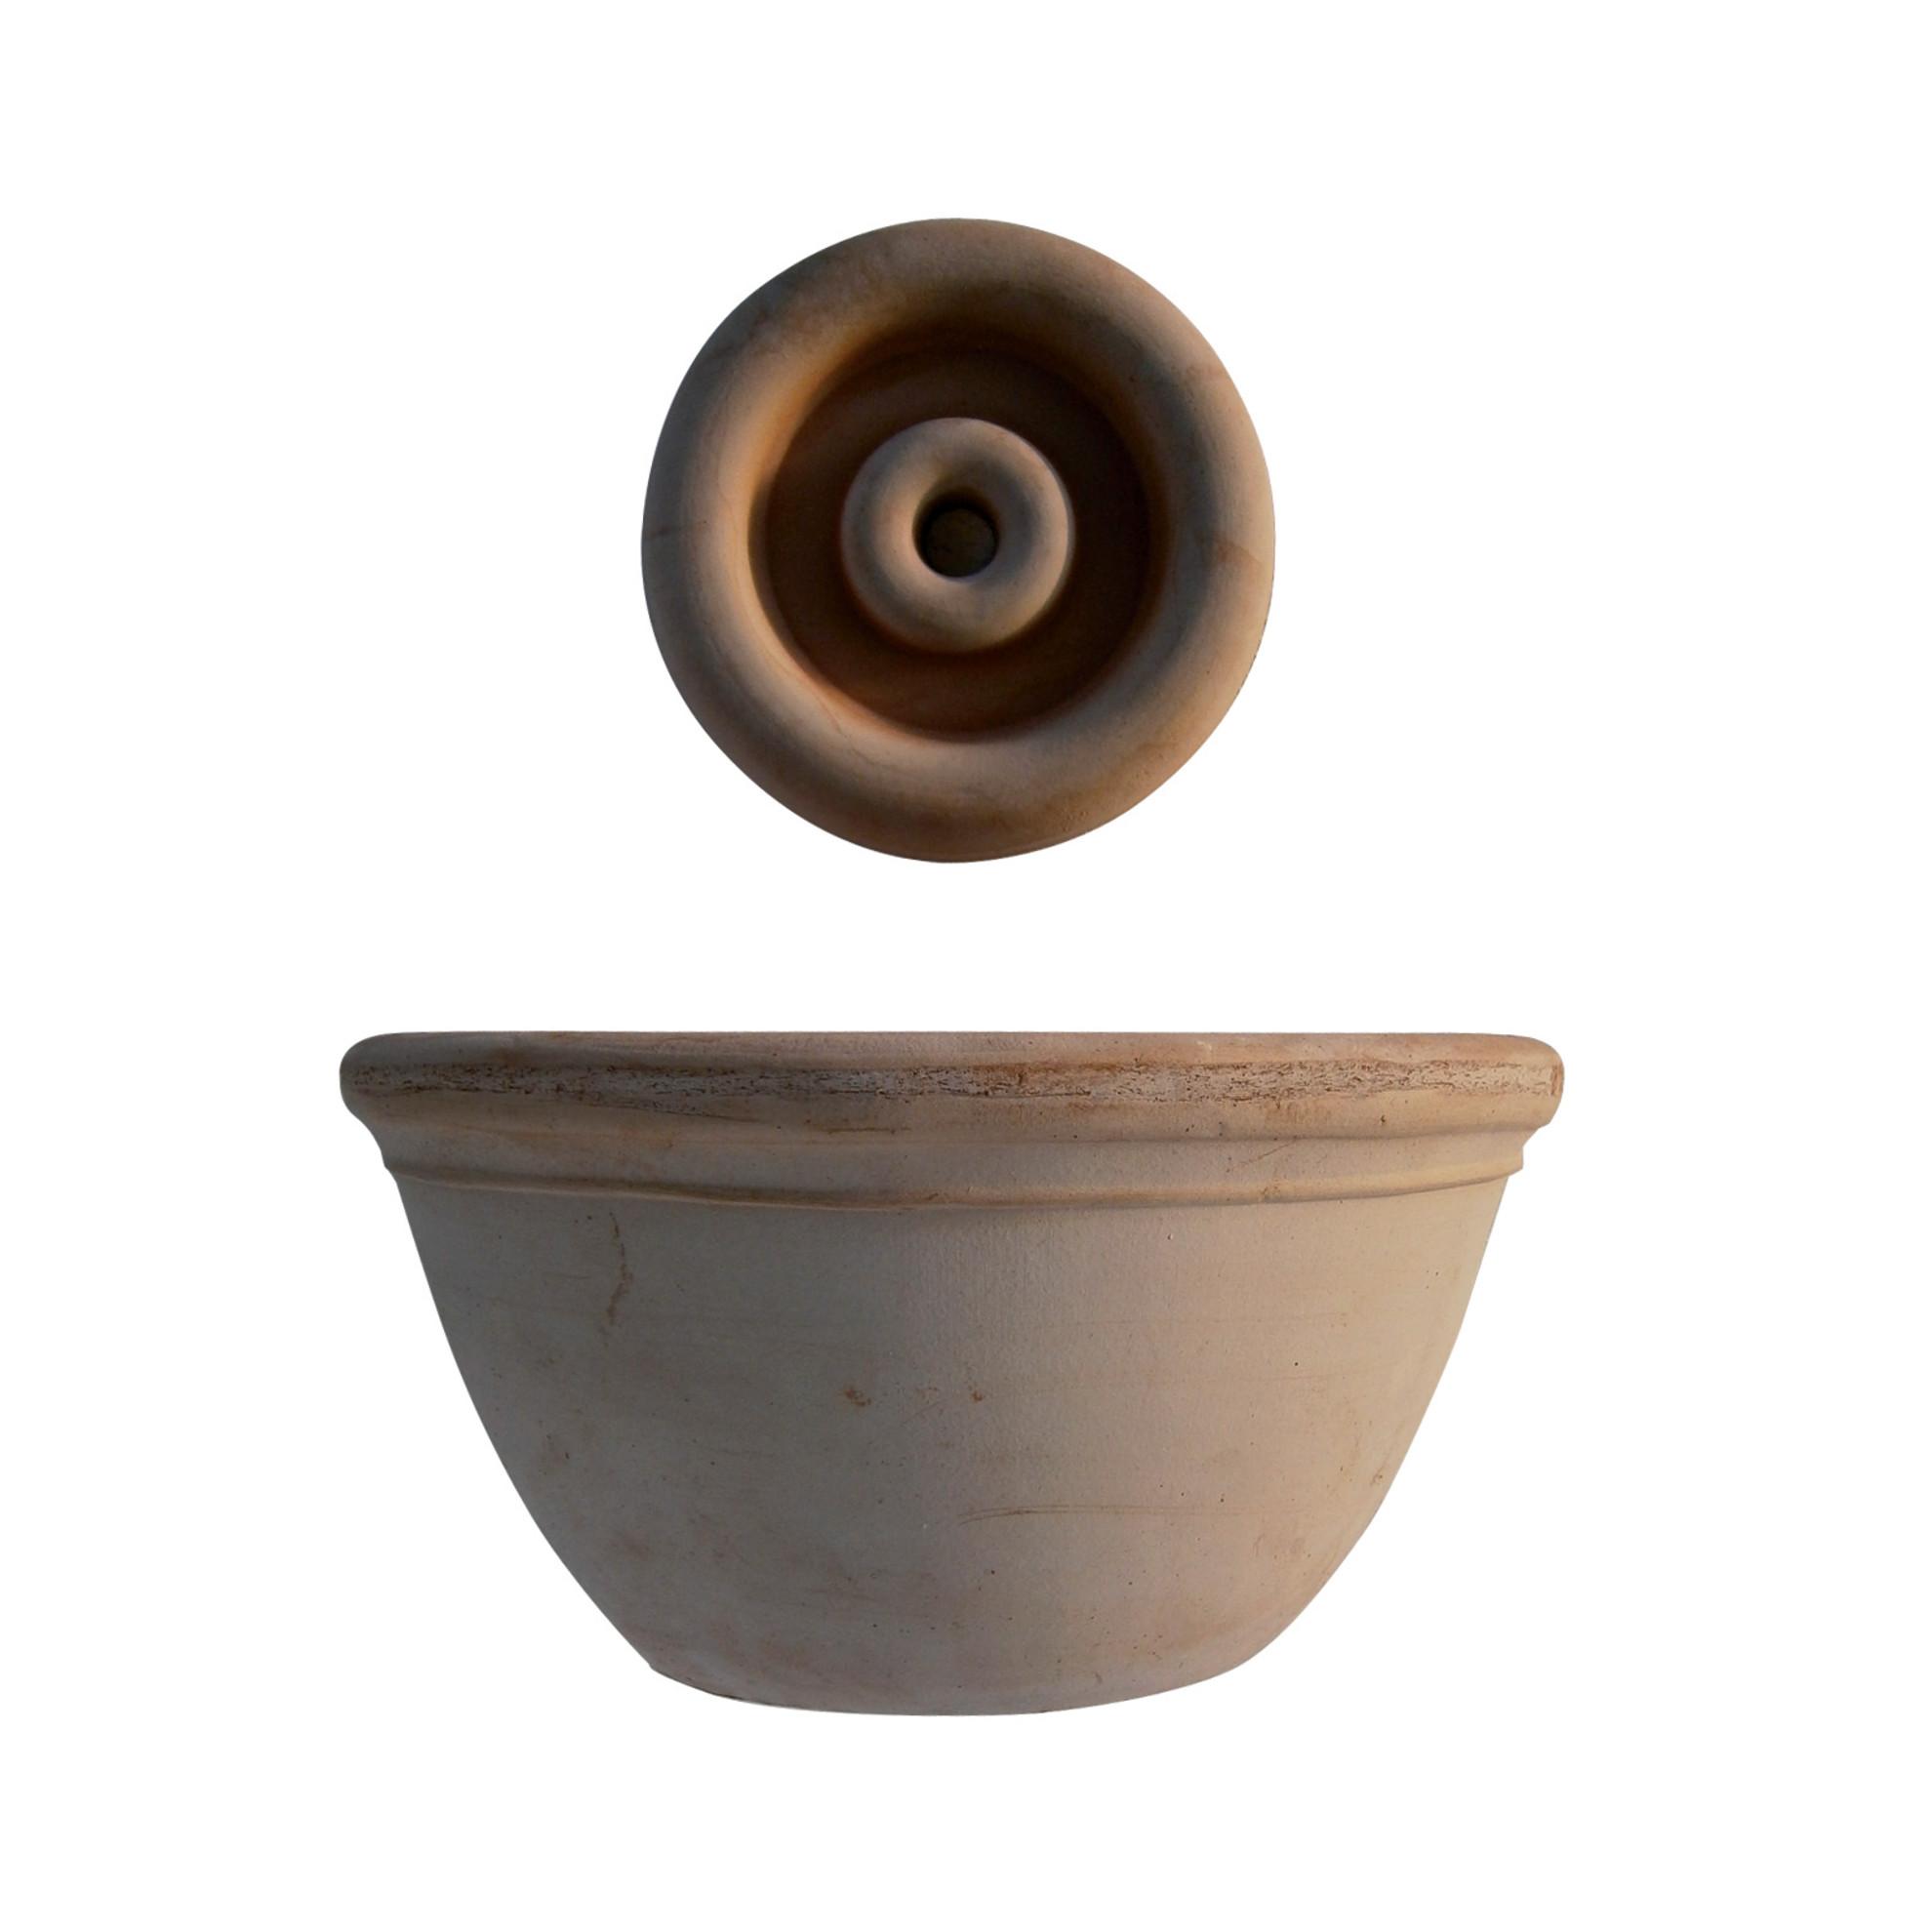 Offerte mobili da giardino ipercoop idee creative e for Lavandini da esterno leroy merlin